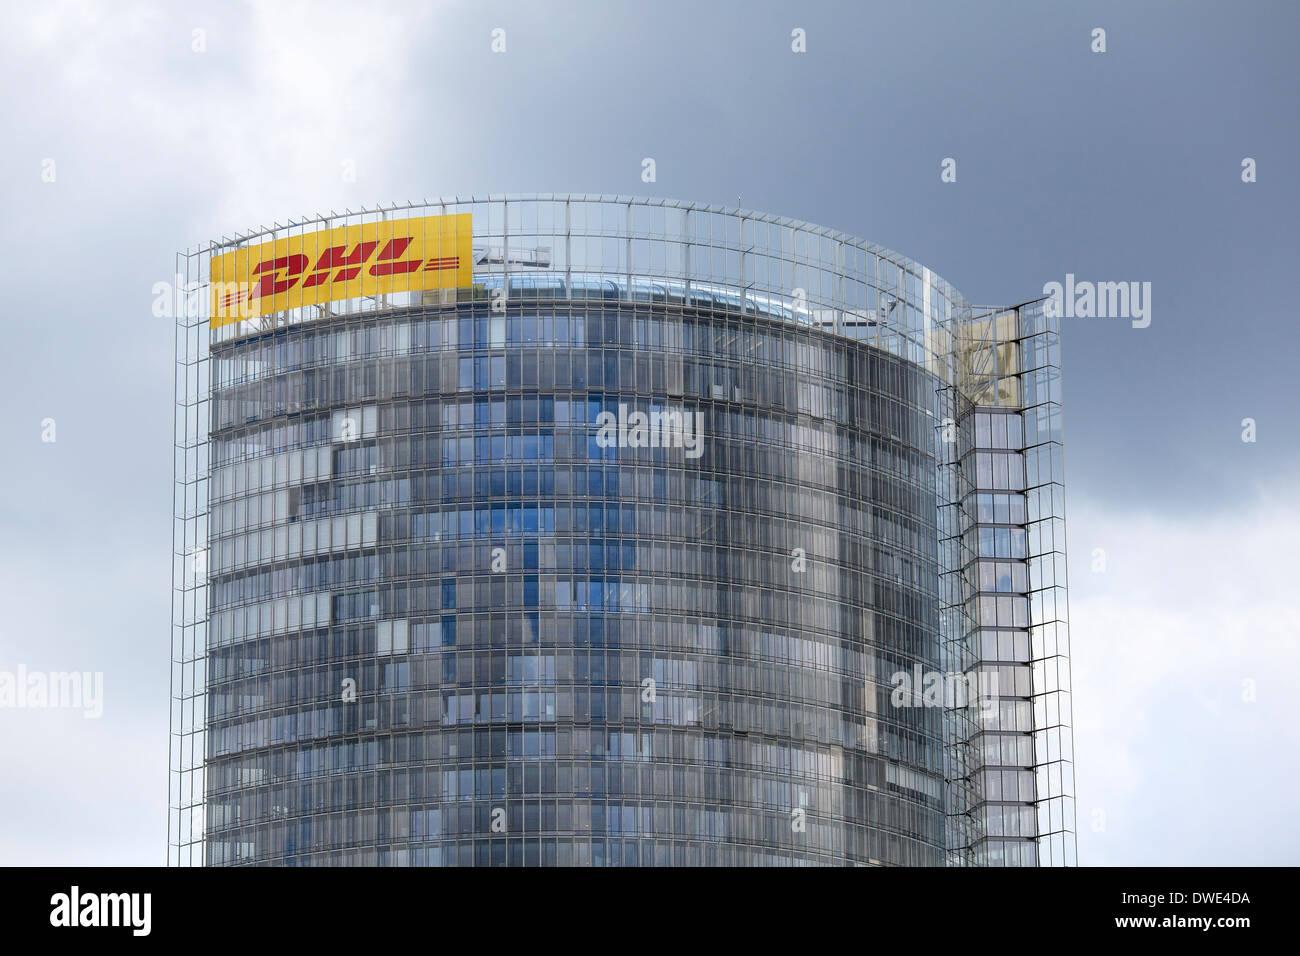 Edificio Torre Post, Deutsche Post DHL sede, Bonn, Alemania. Foto de stock